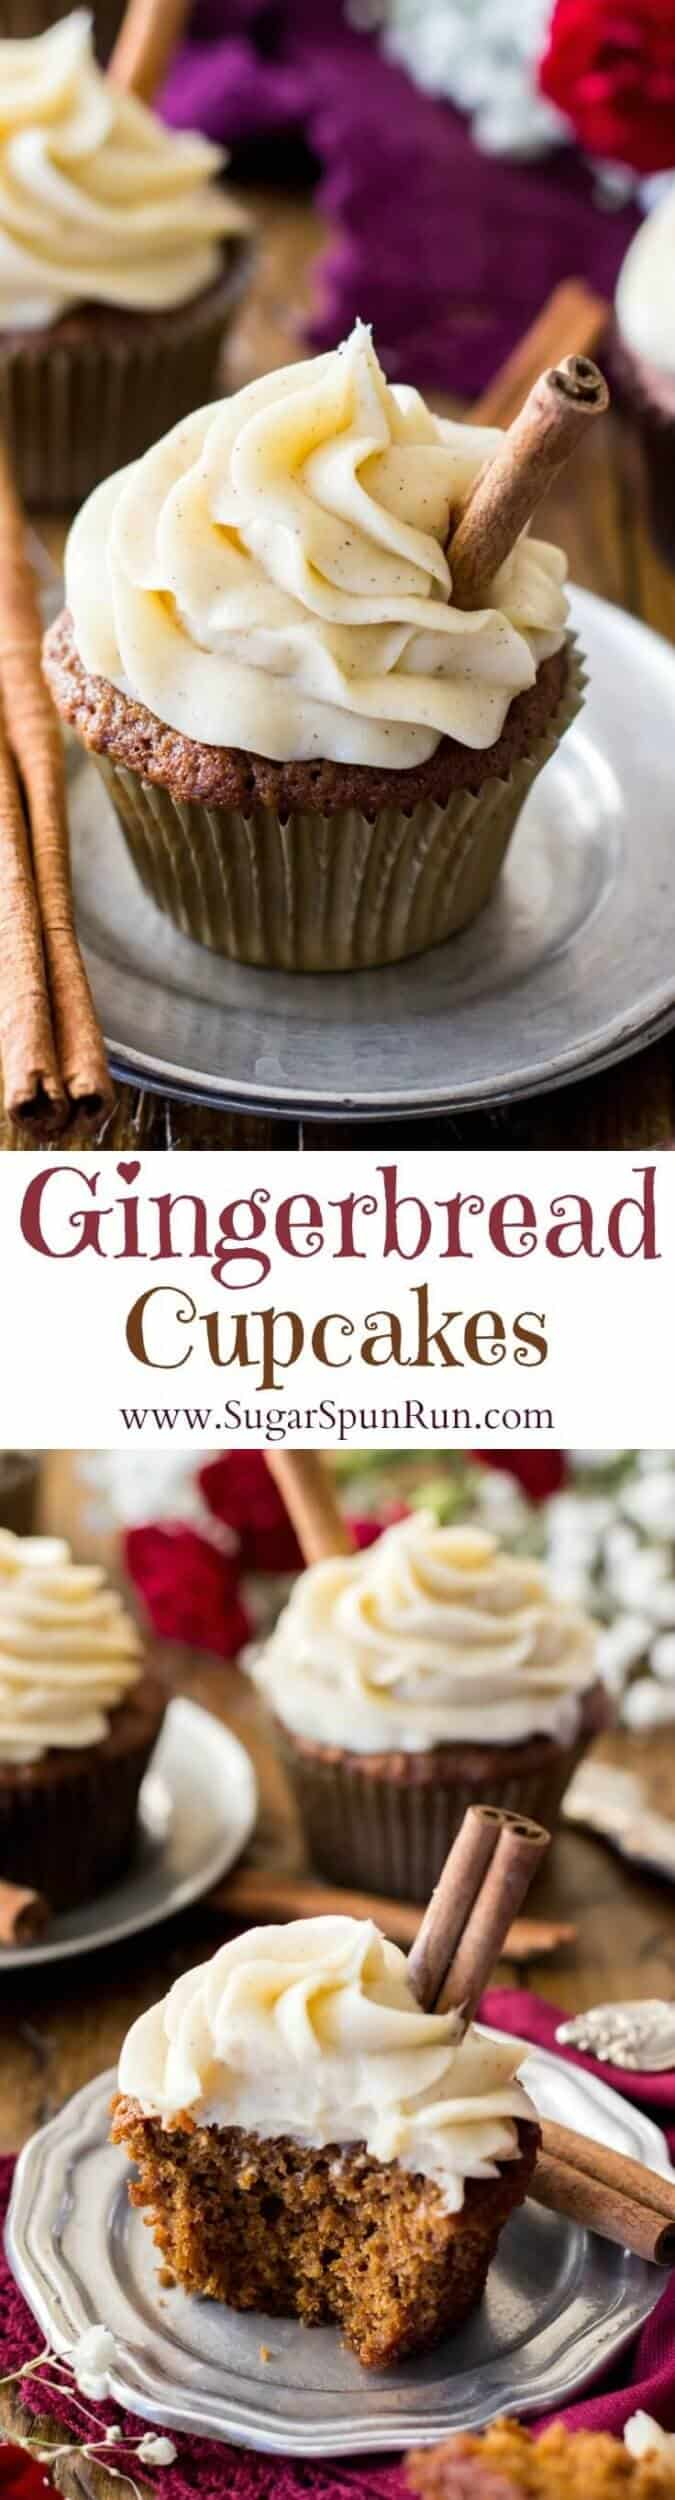 Gingerbread Cupcakes || SugarSpunRun